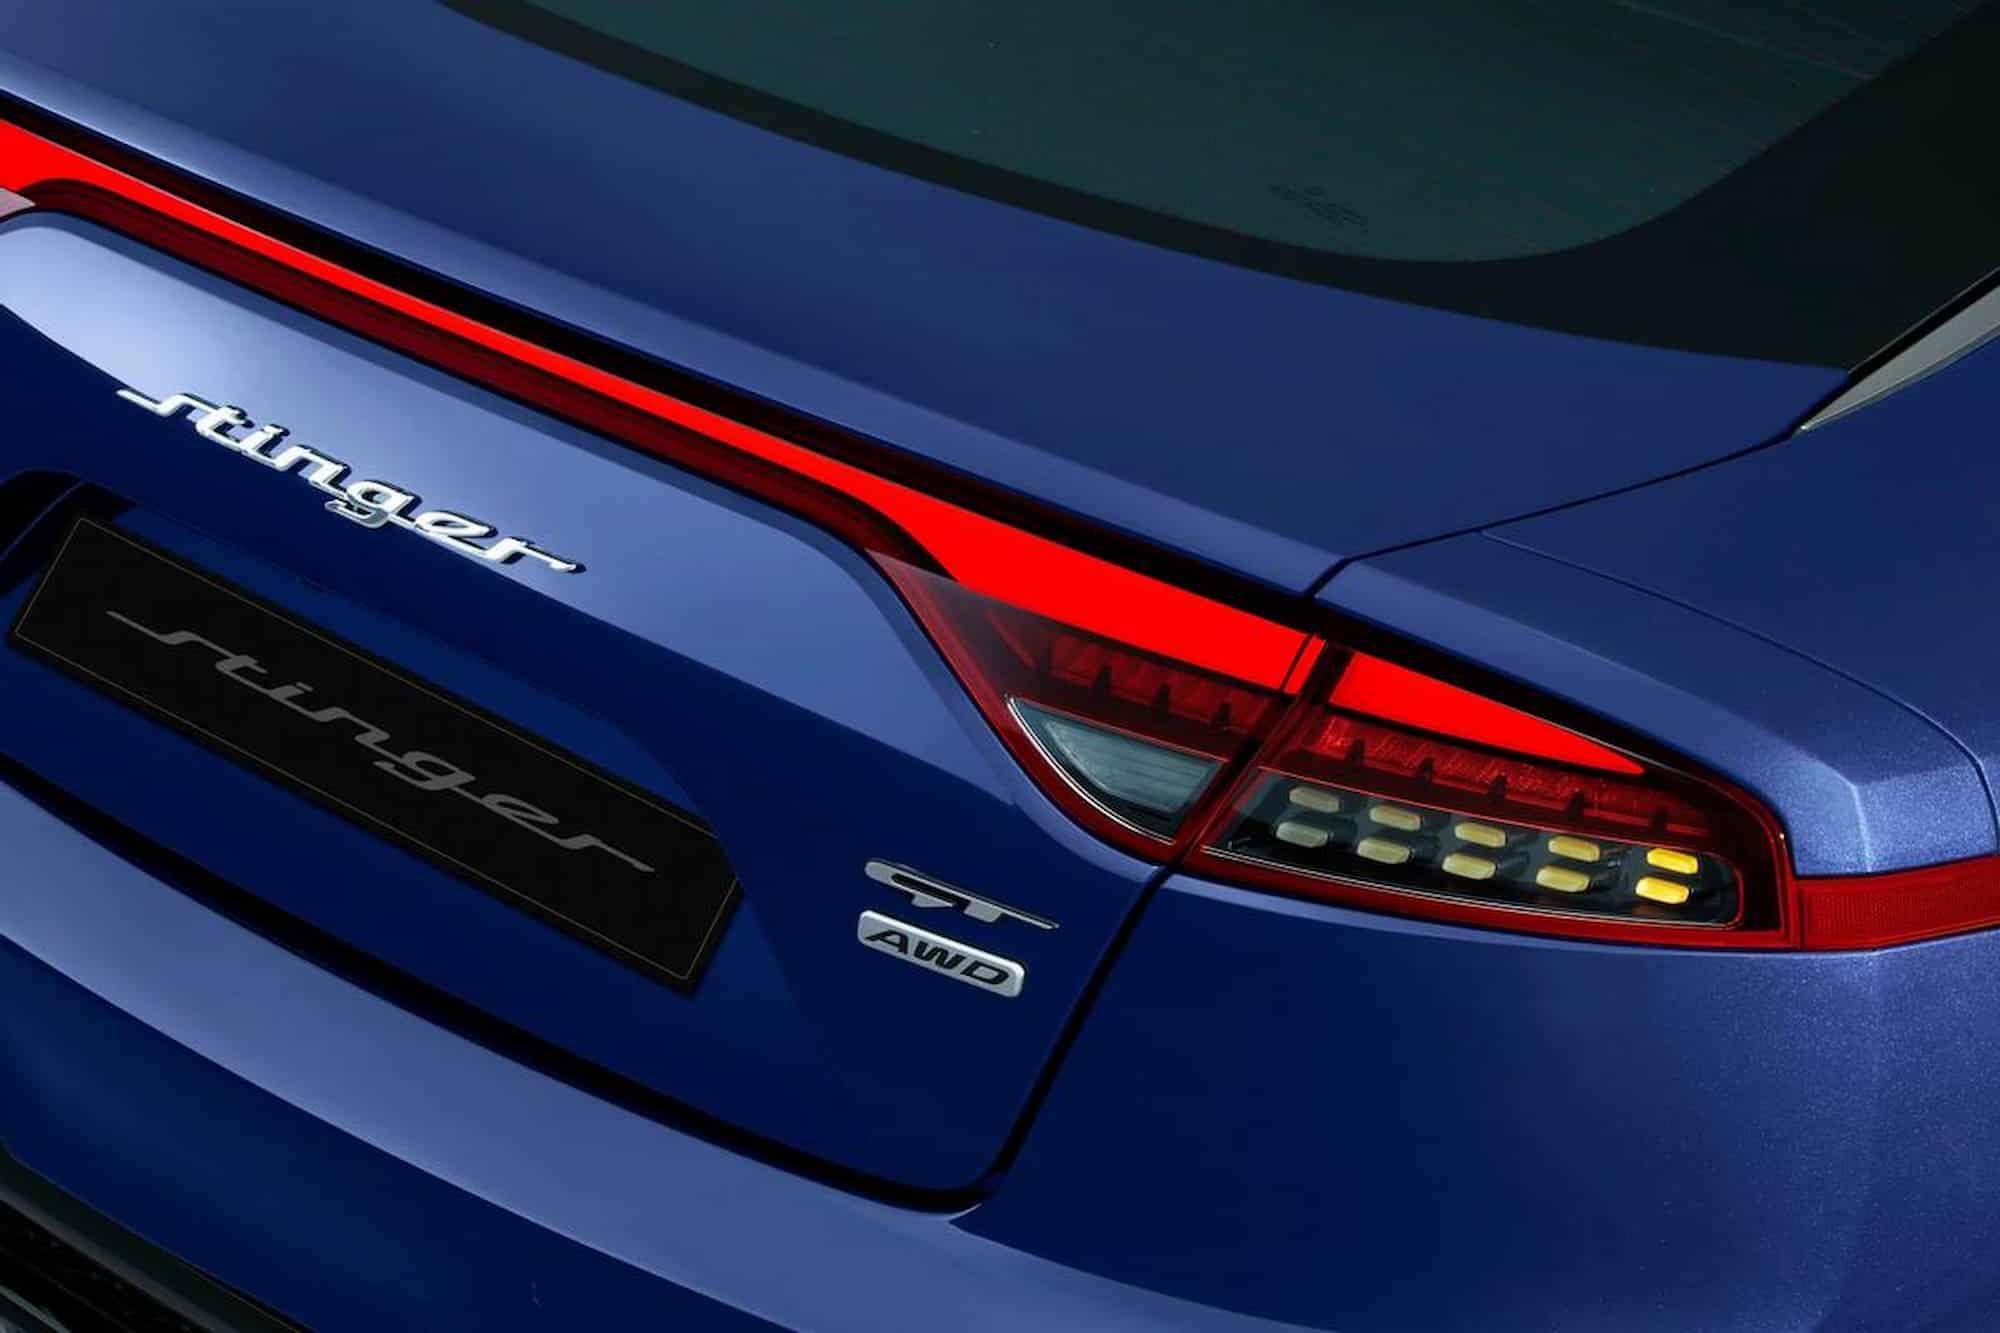 new kia stinger oem badge blue detail exterior rear taillight